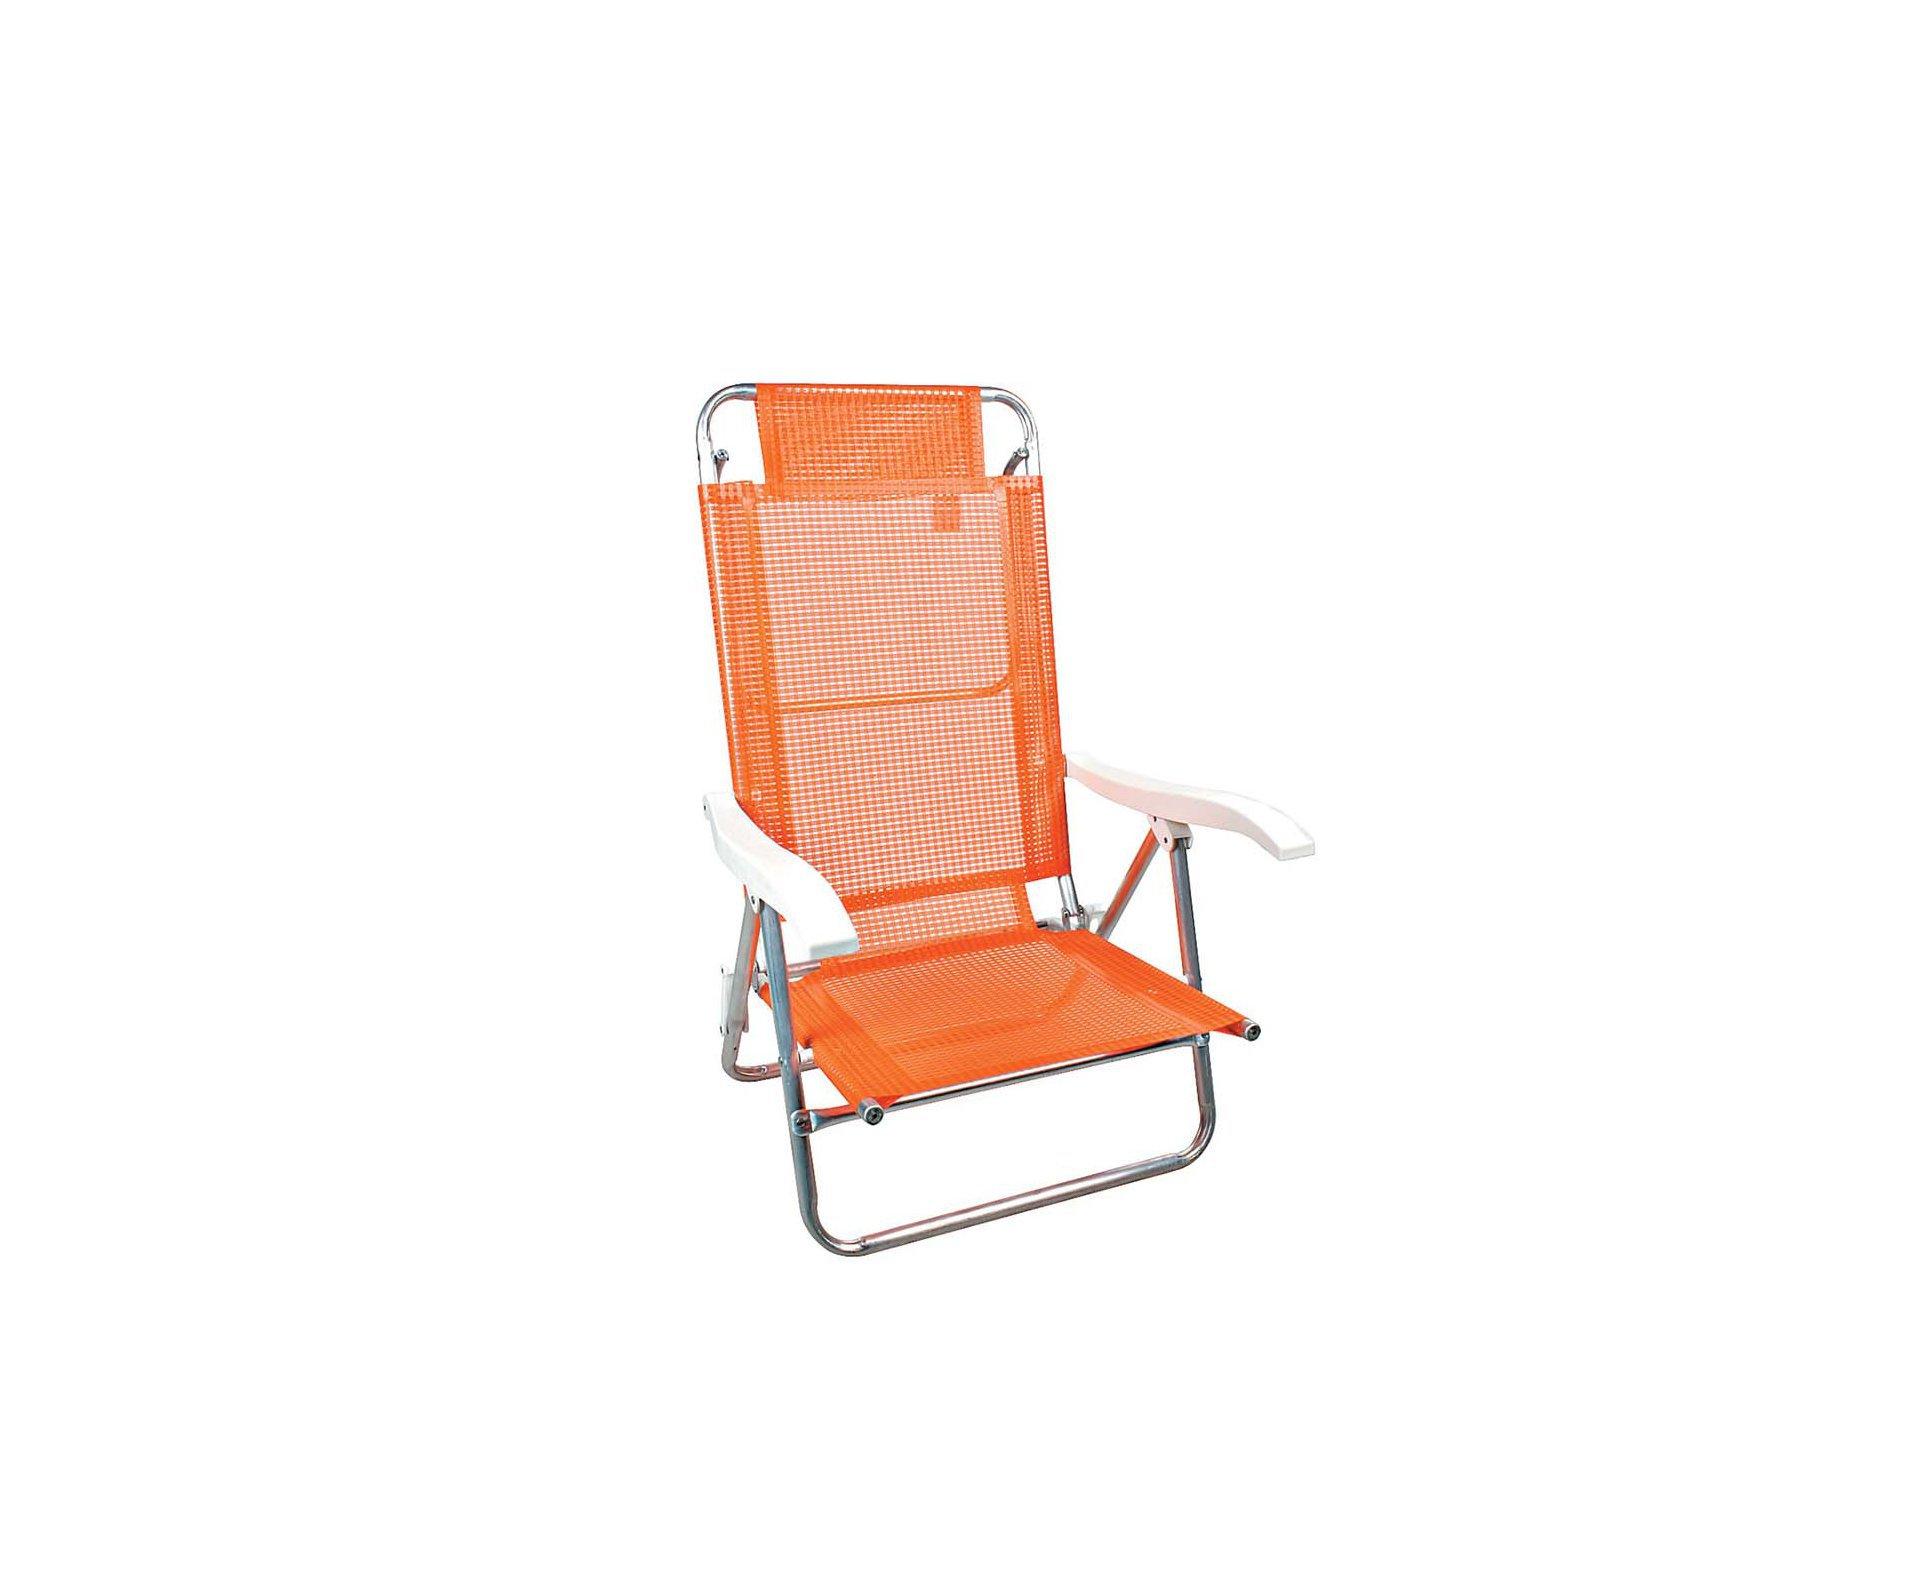 Cadeira Reclinavel De Praia Aluminio Mor Fashion - Laranja